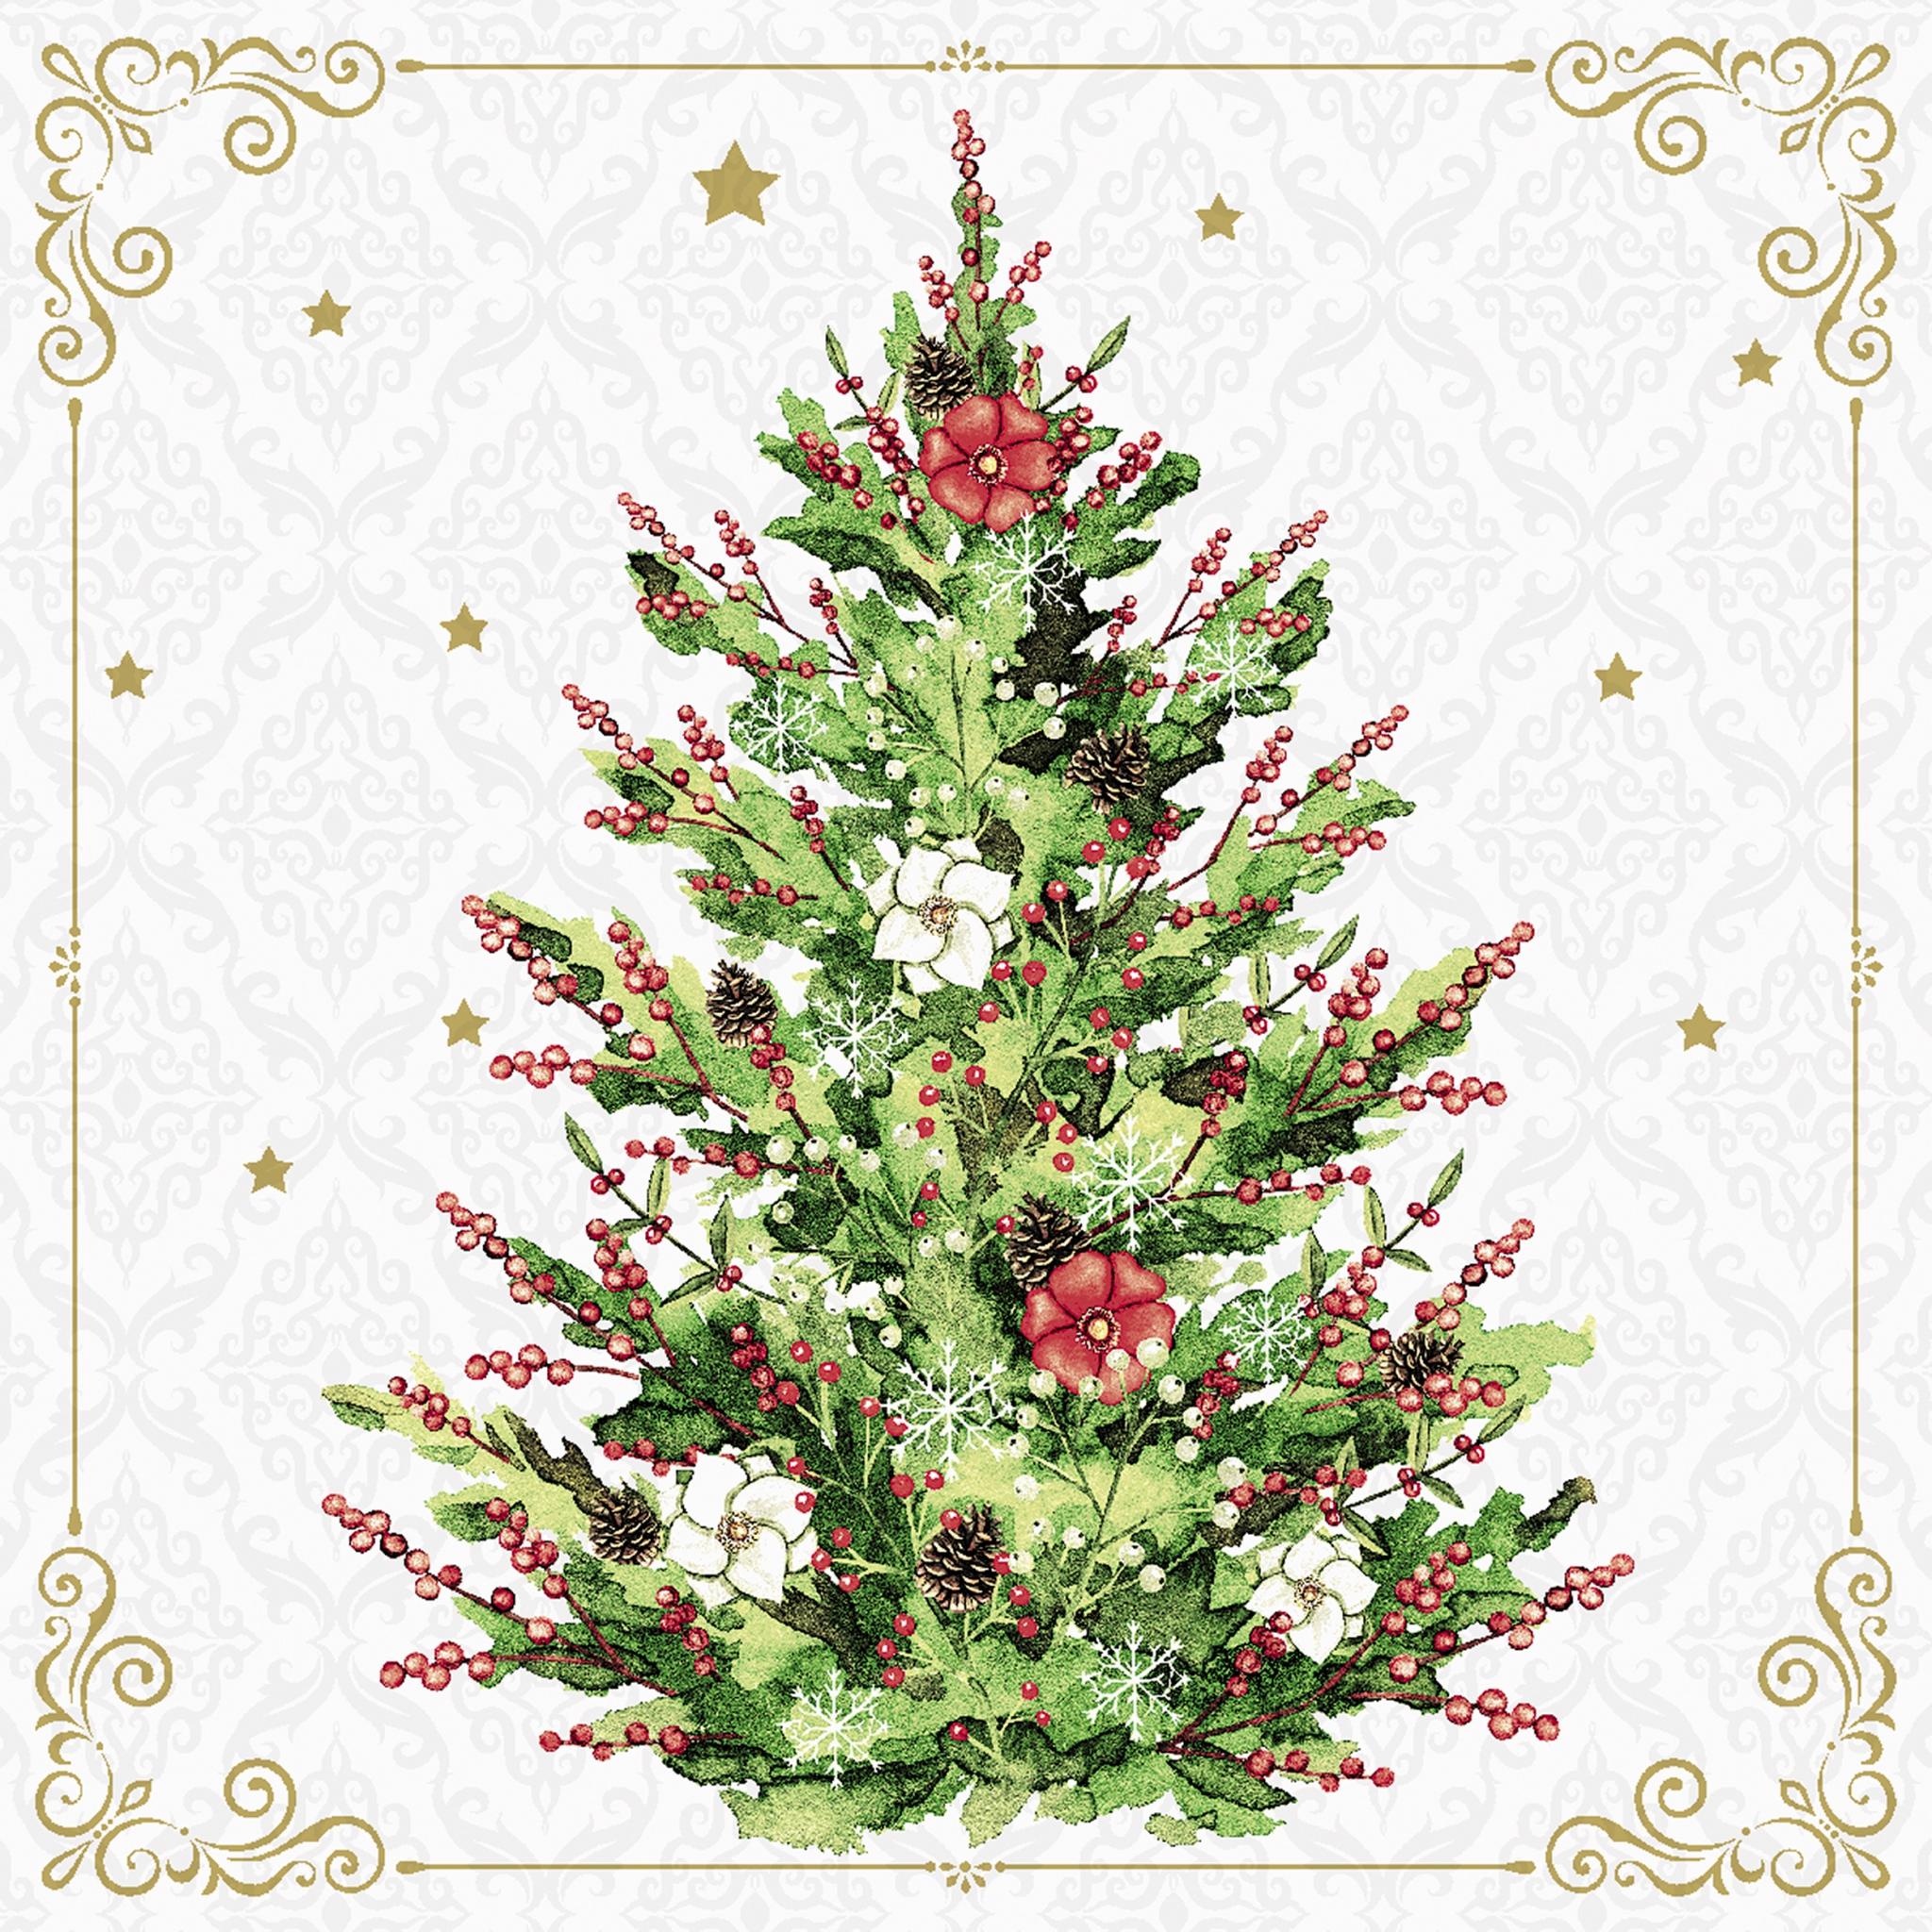 Servilletas 40x40 cm - Christmas Tree